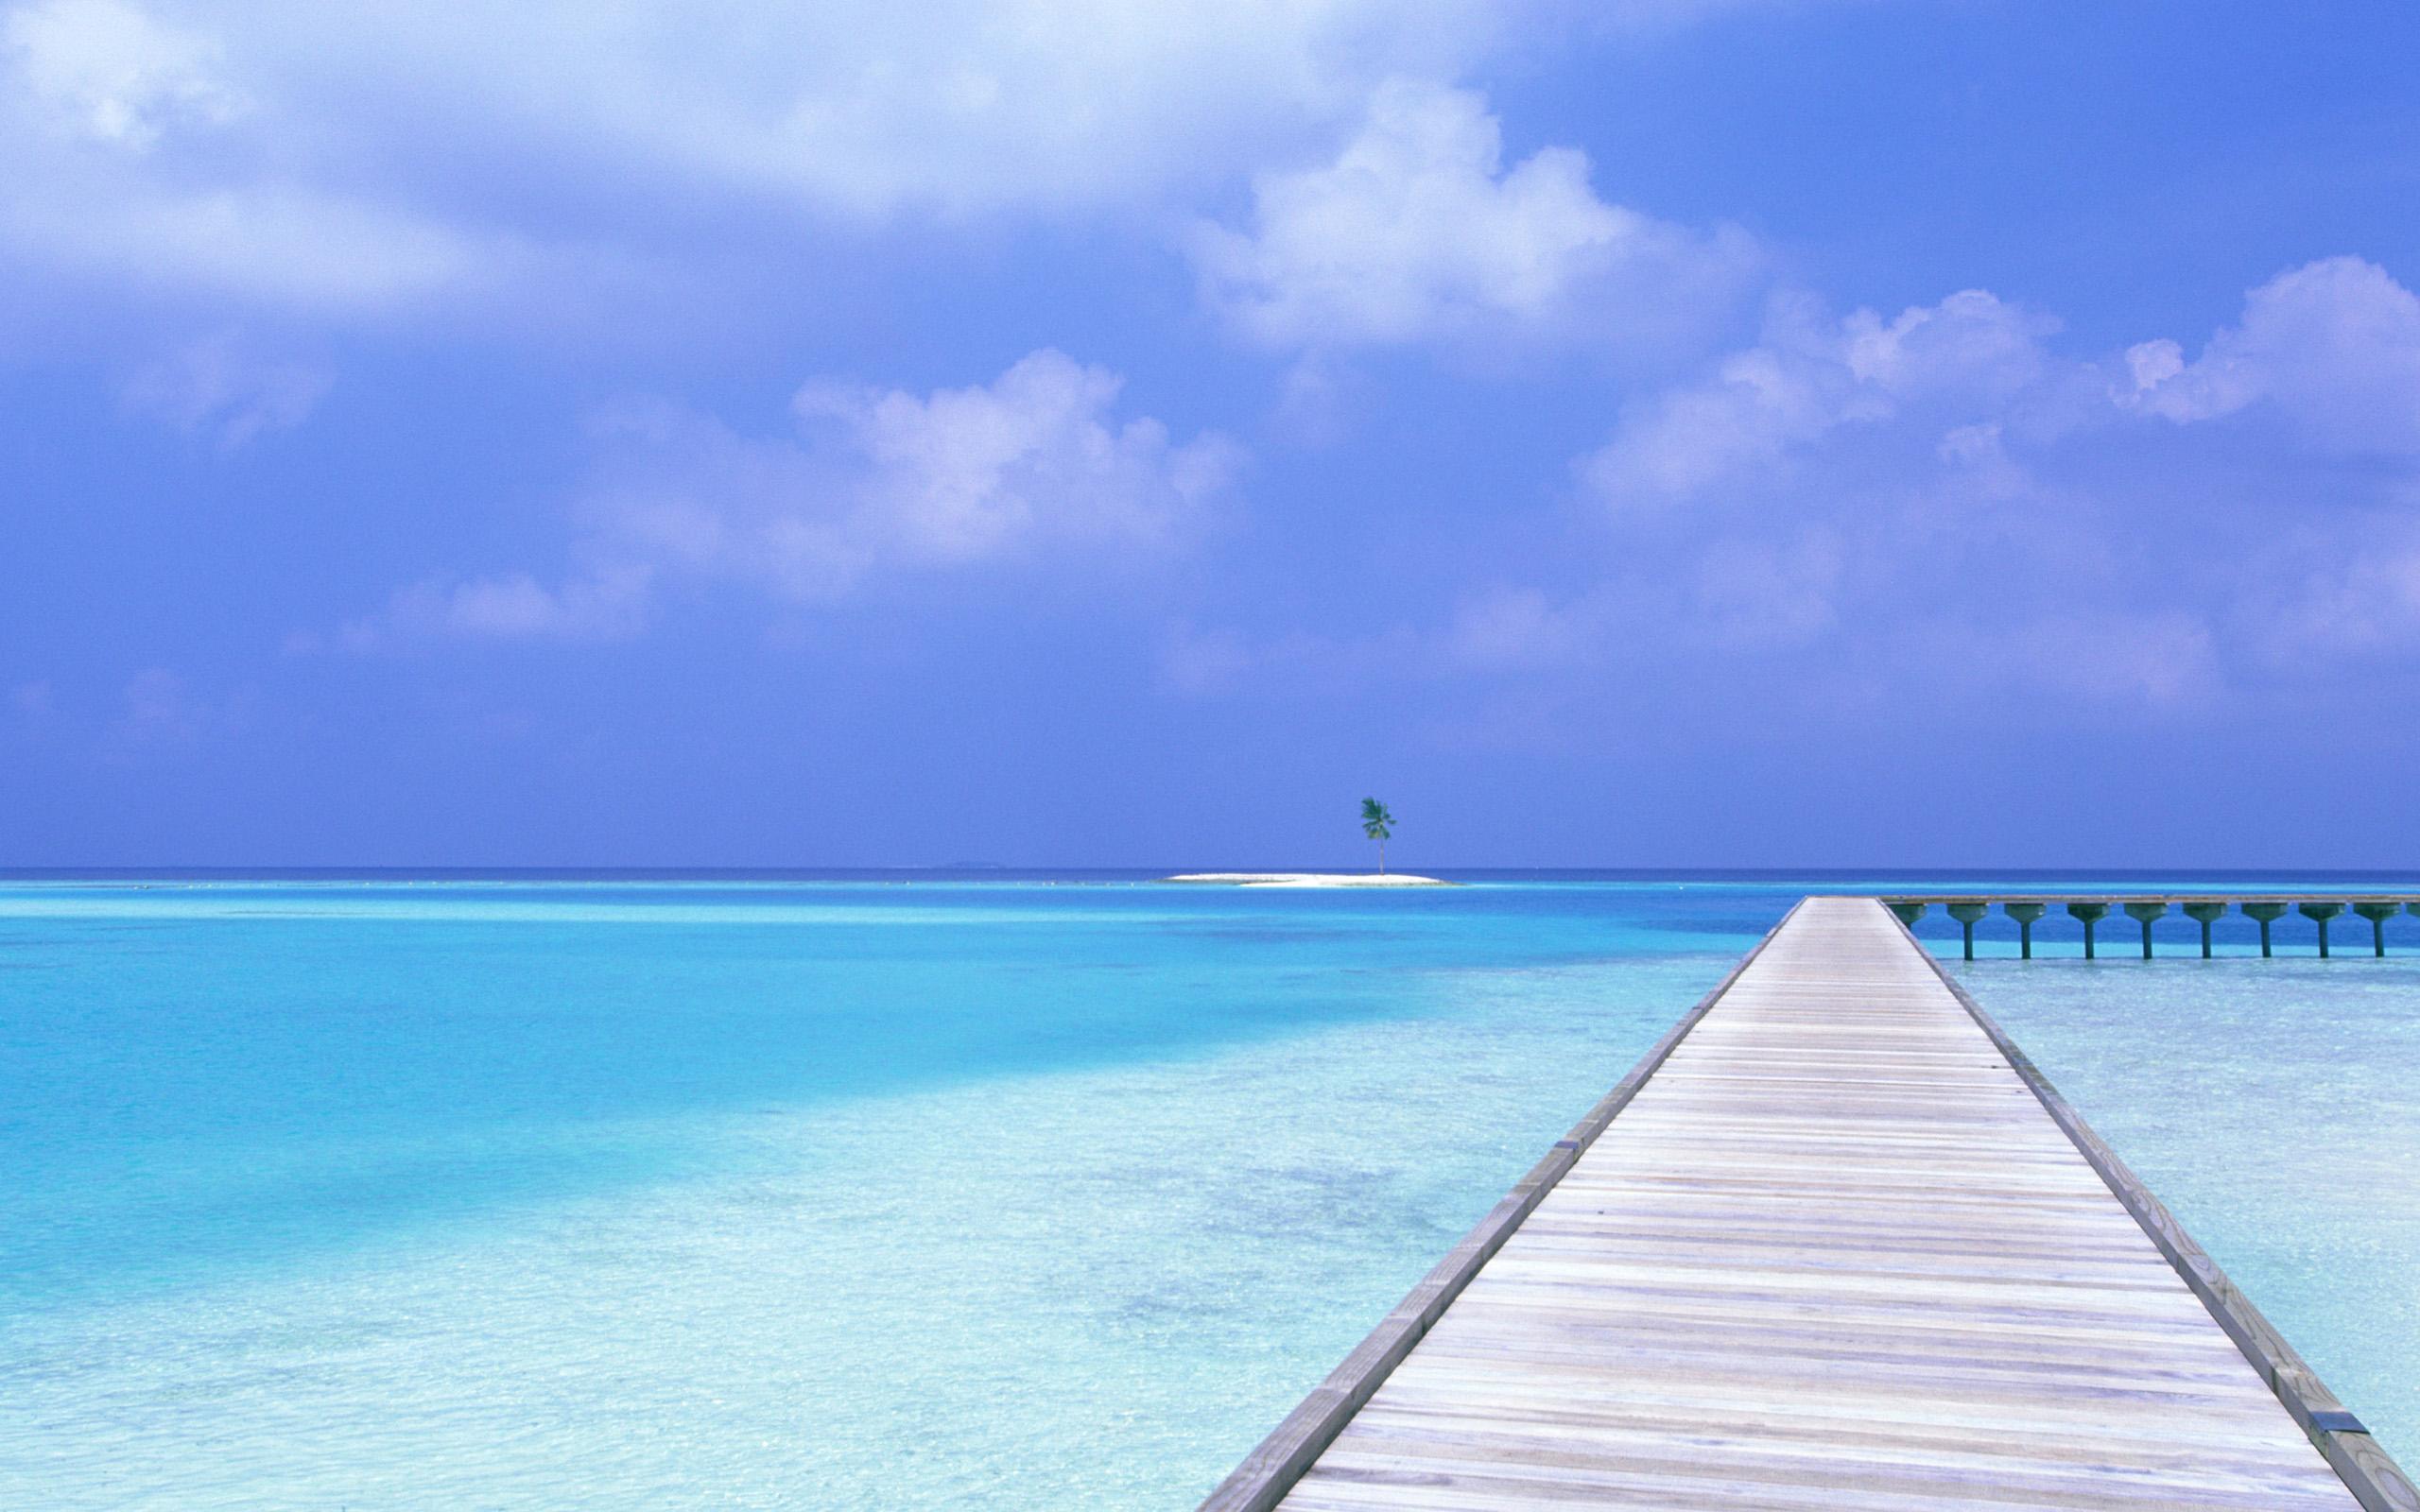 Beach Blue Sky Wallpapers HD Wallpapers 2560x1600